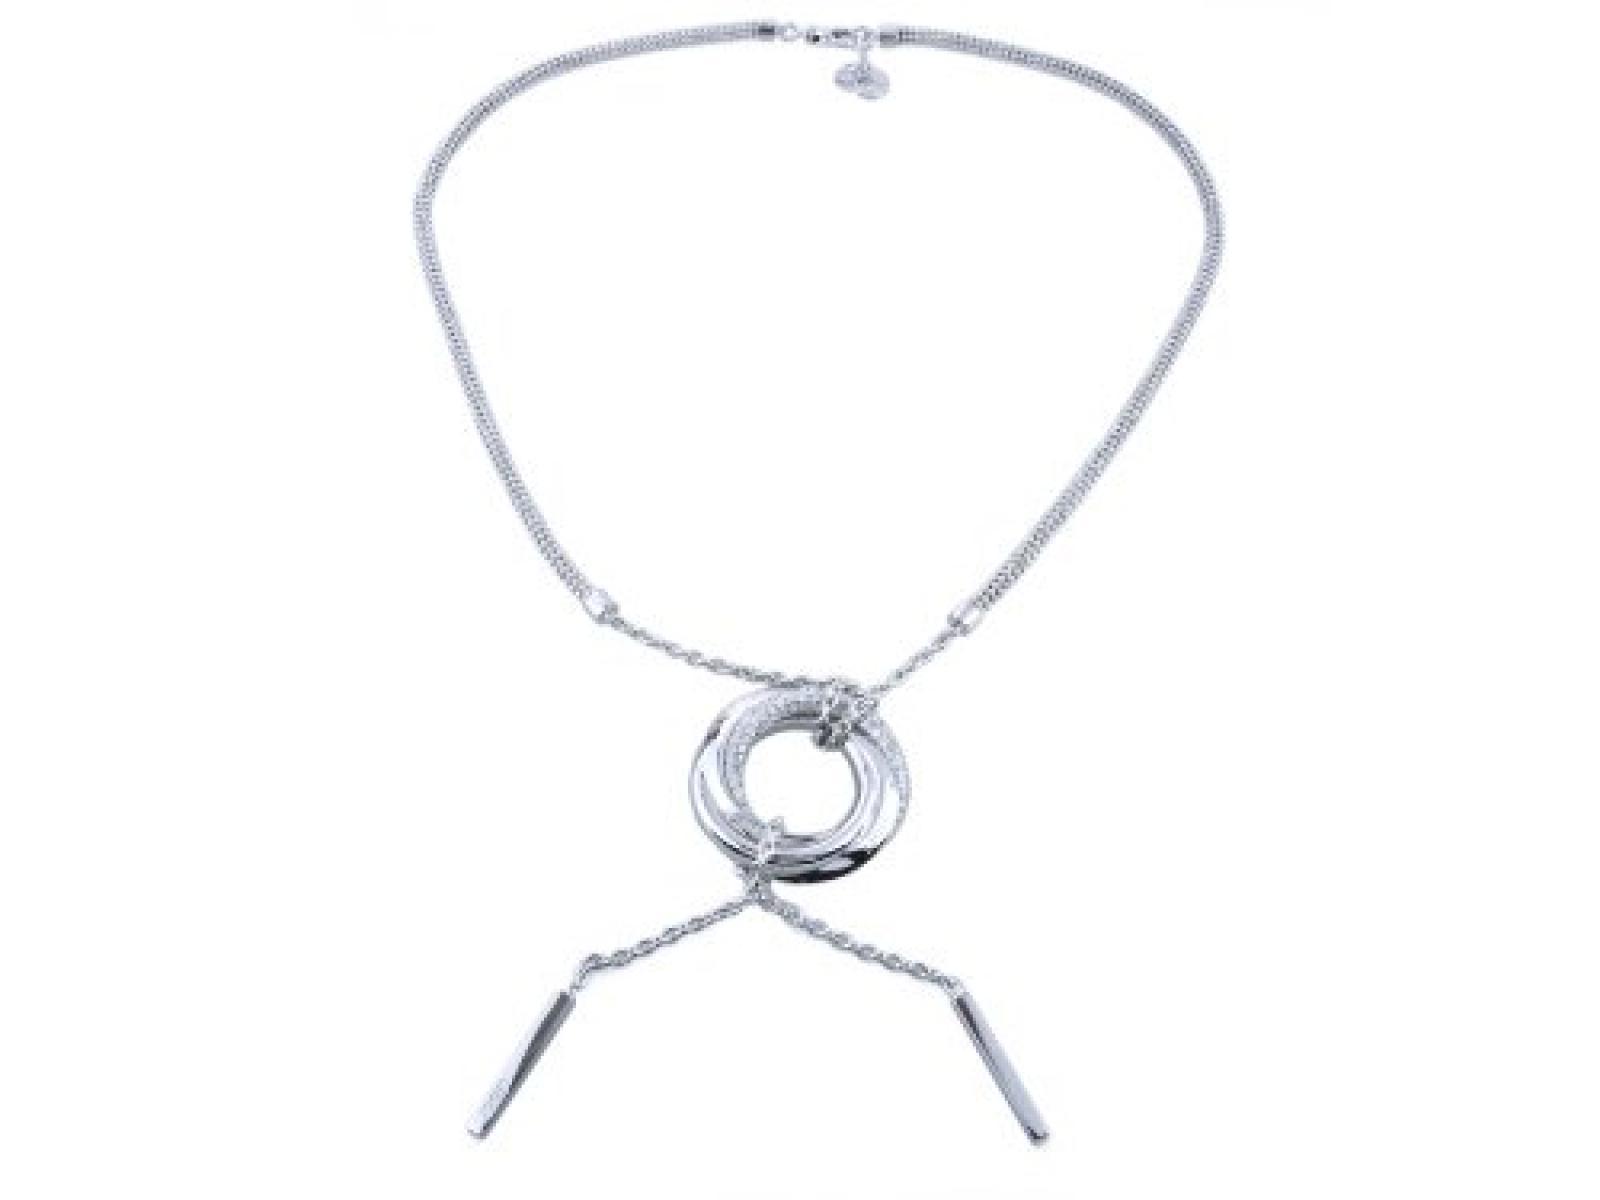 Joop! Damen-Halskette 925 Silber JPNL90313A470